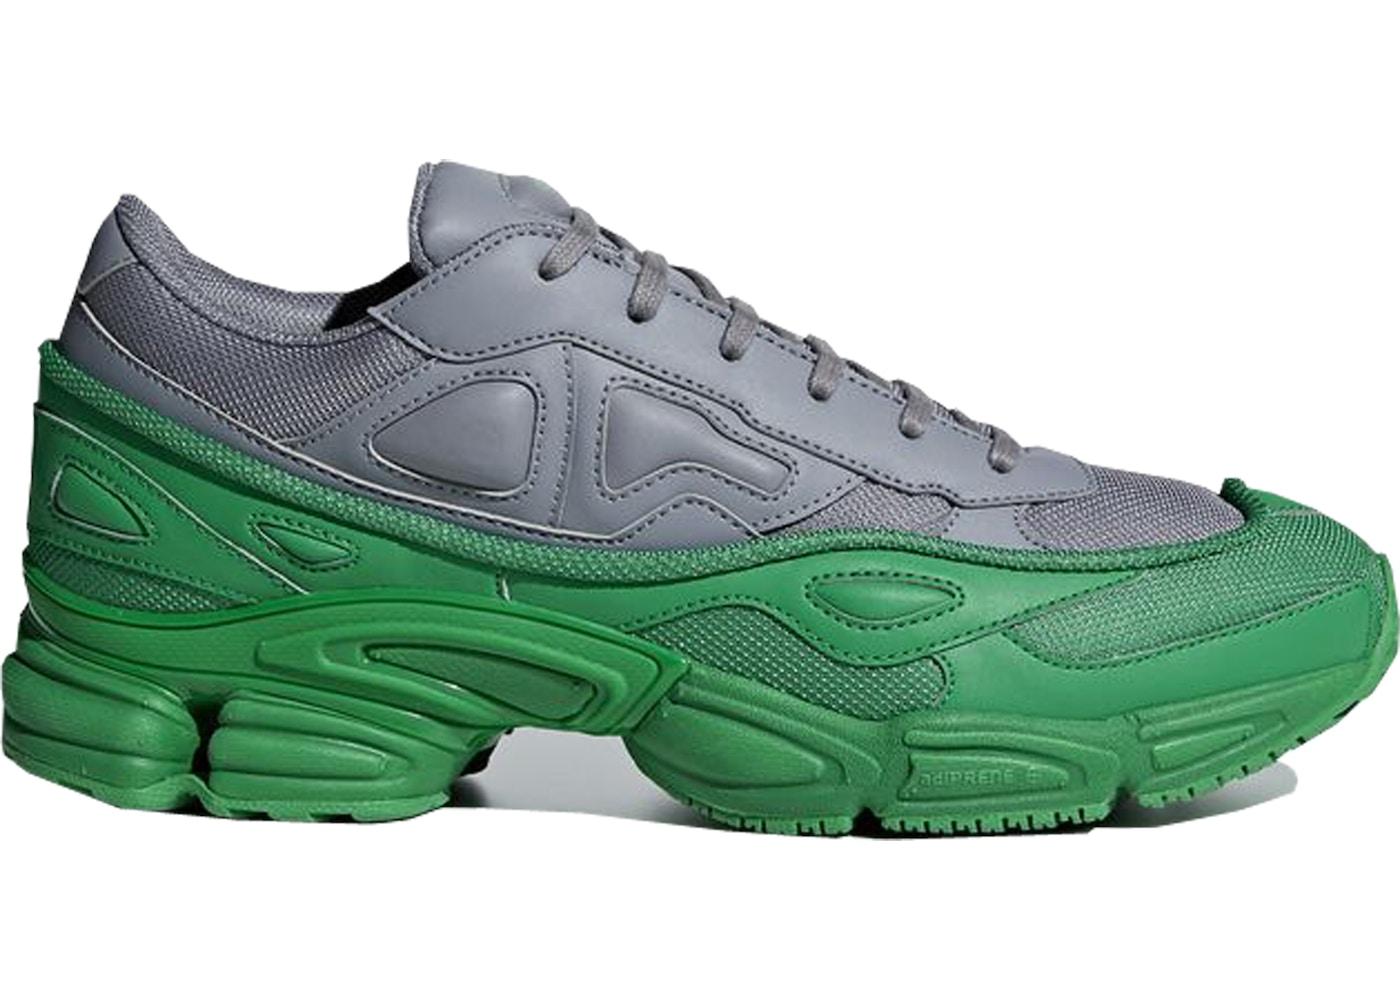 on sale 75ae5 80d9d adidas Ozweego Raf Simons Green Grey